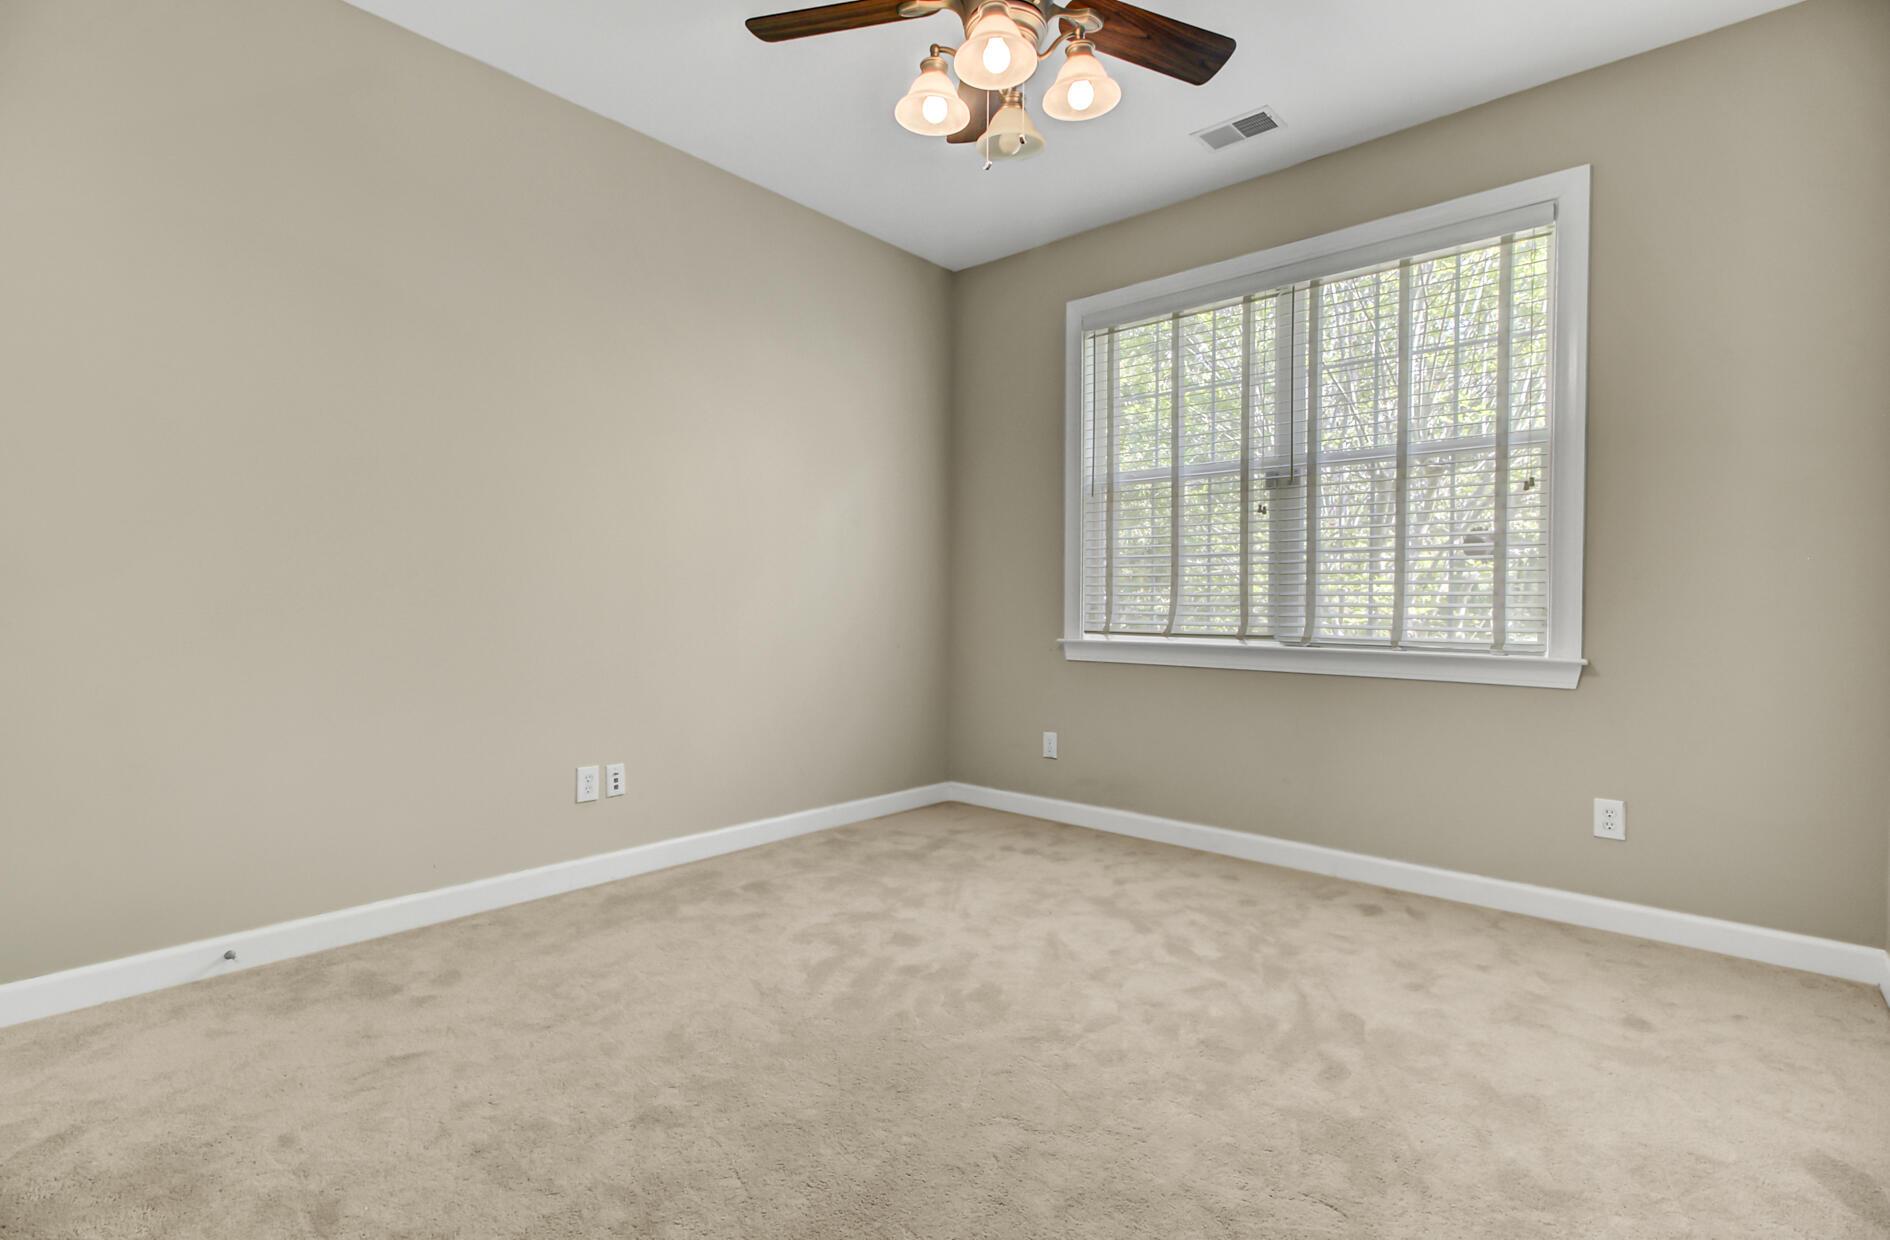 Marsh Cove Homes For Sale - 2928 Riverwood, Mount Pleasant, SC - 24